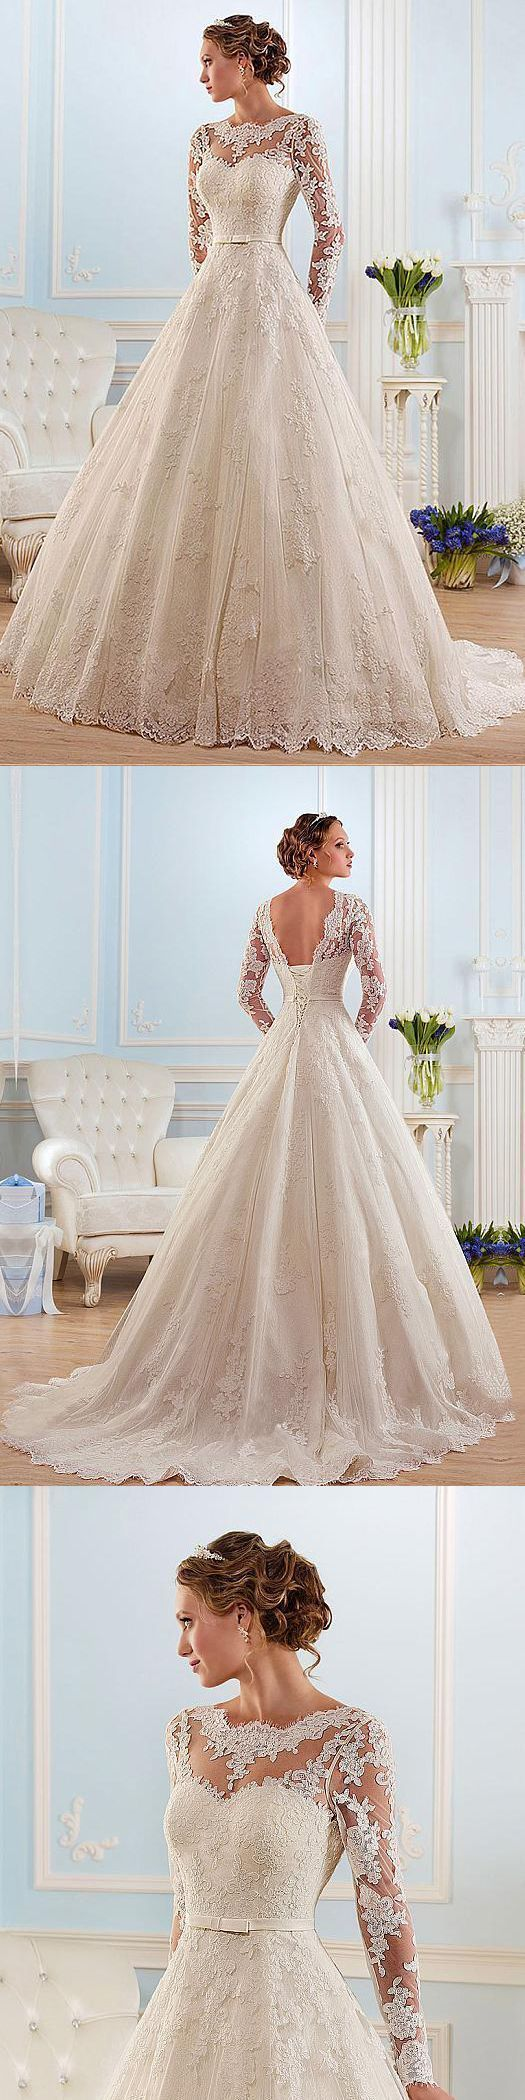 Best 25 western wedding dresses ideas on pinterest for Halloween wedding dresses plus size